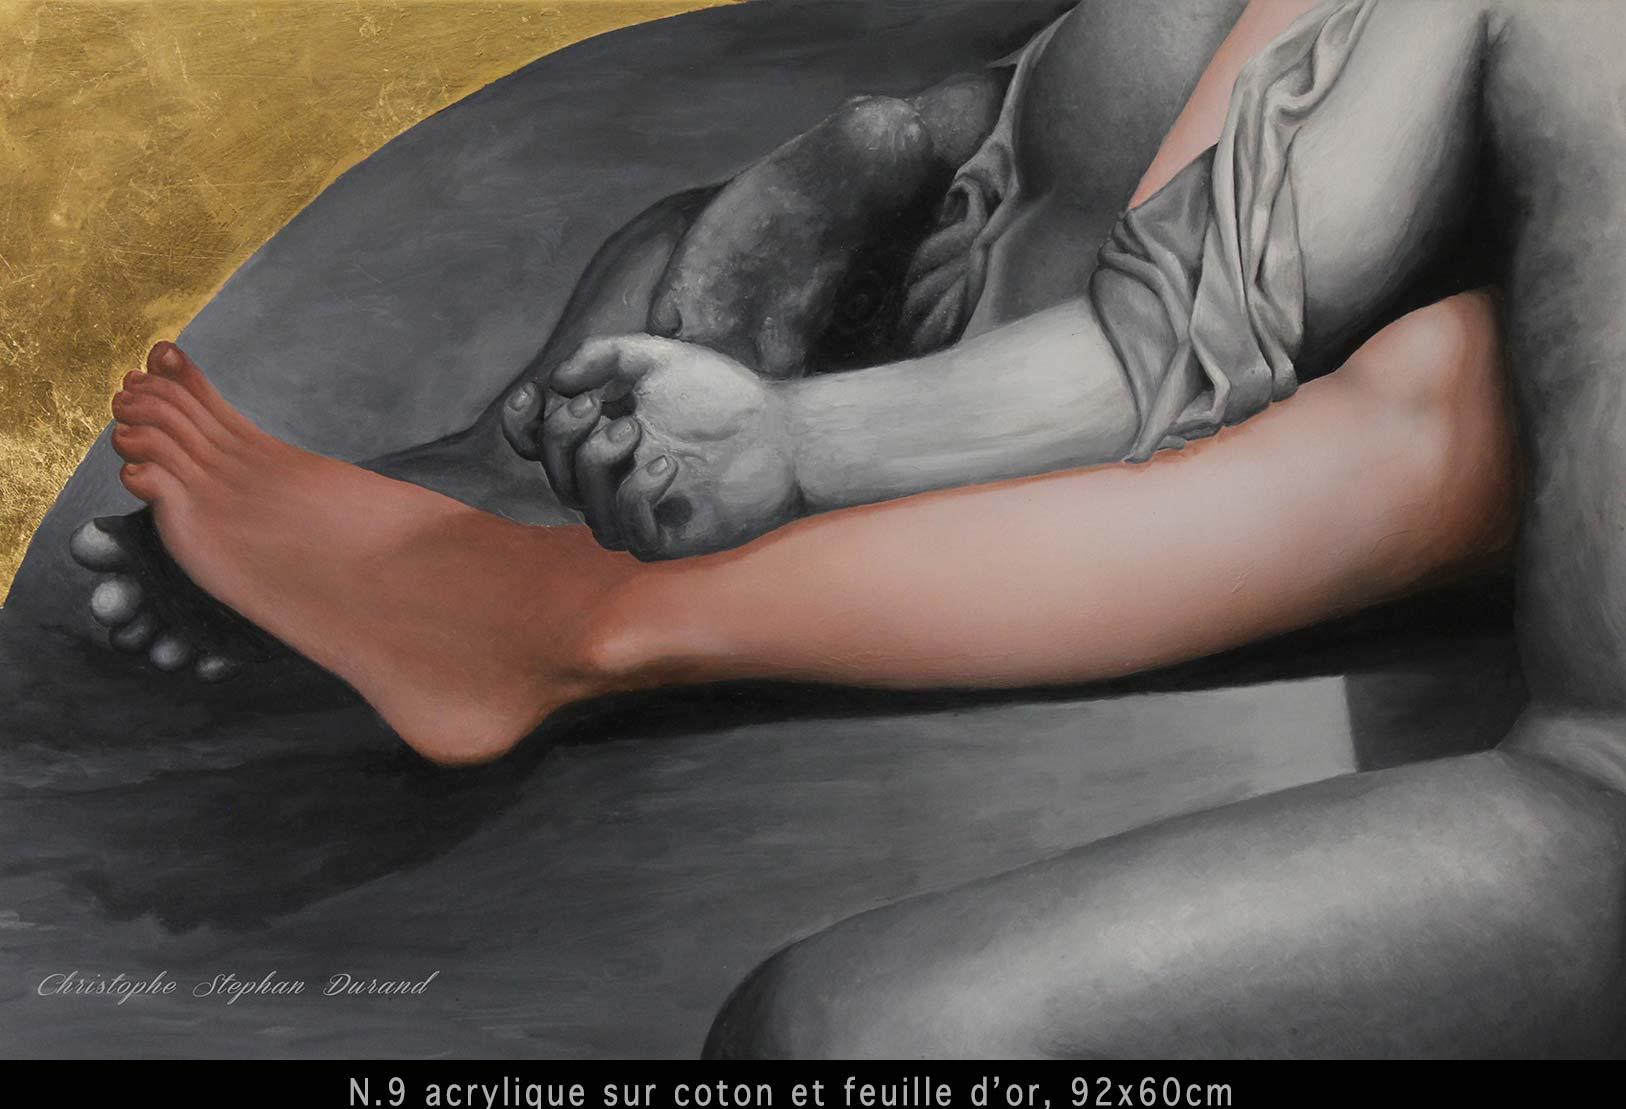 Christophe Stephan Durand n.9